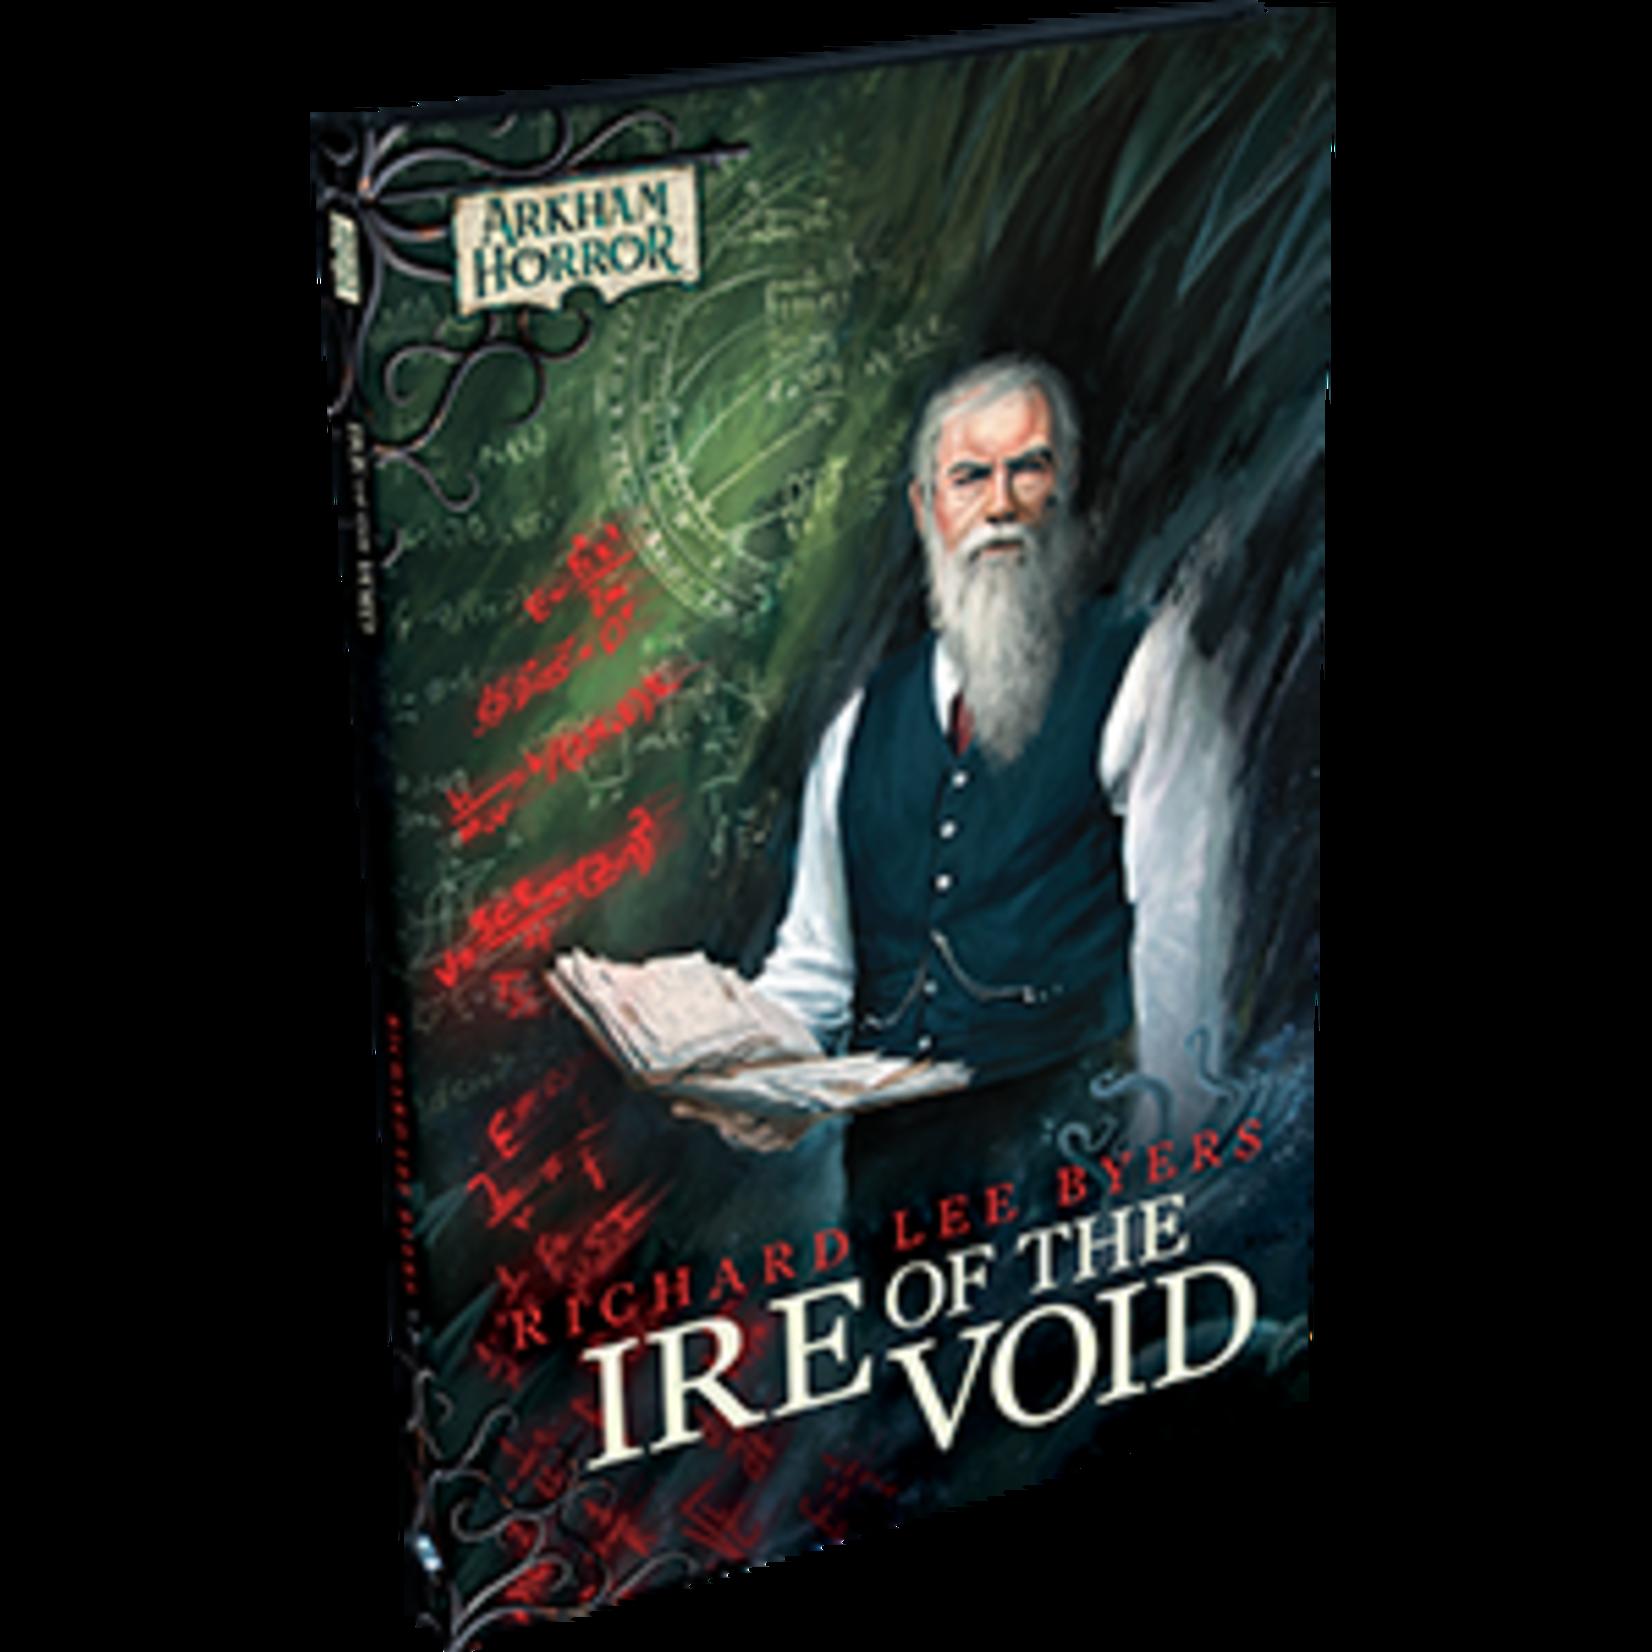 Fantasy Flight Games Arkham Horror Novella: Ire of the Void